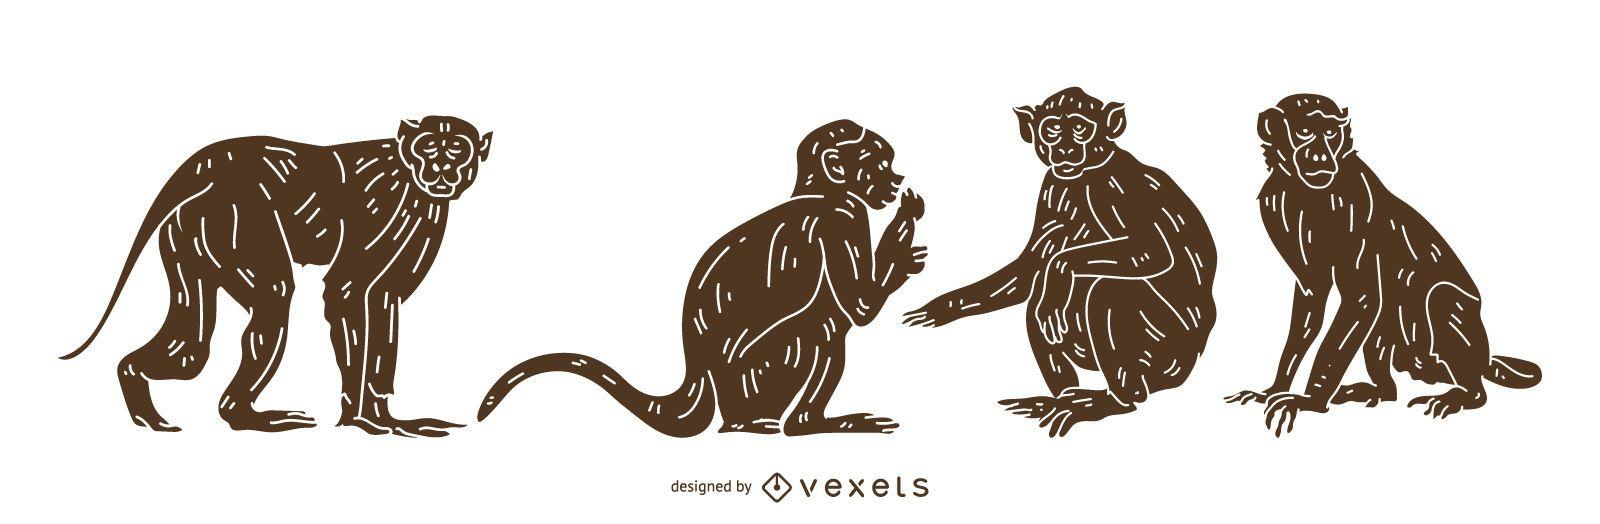 Monkey Detailed Silhouette Design